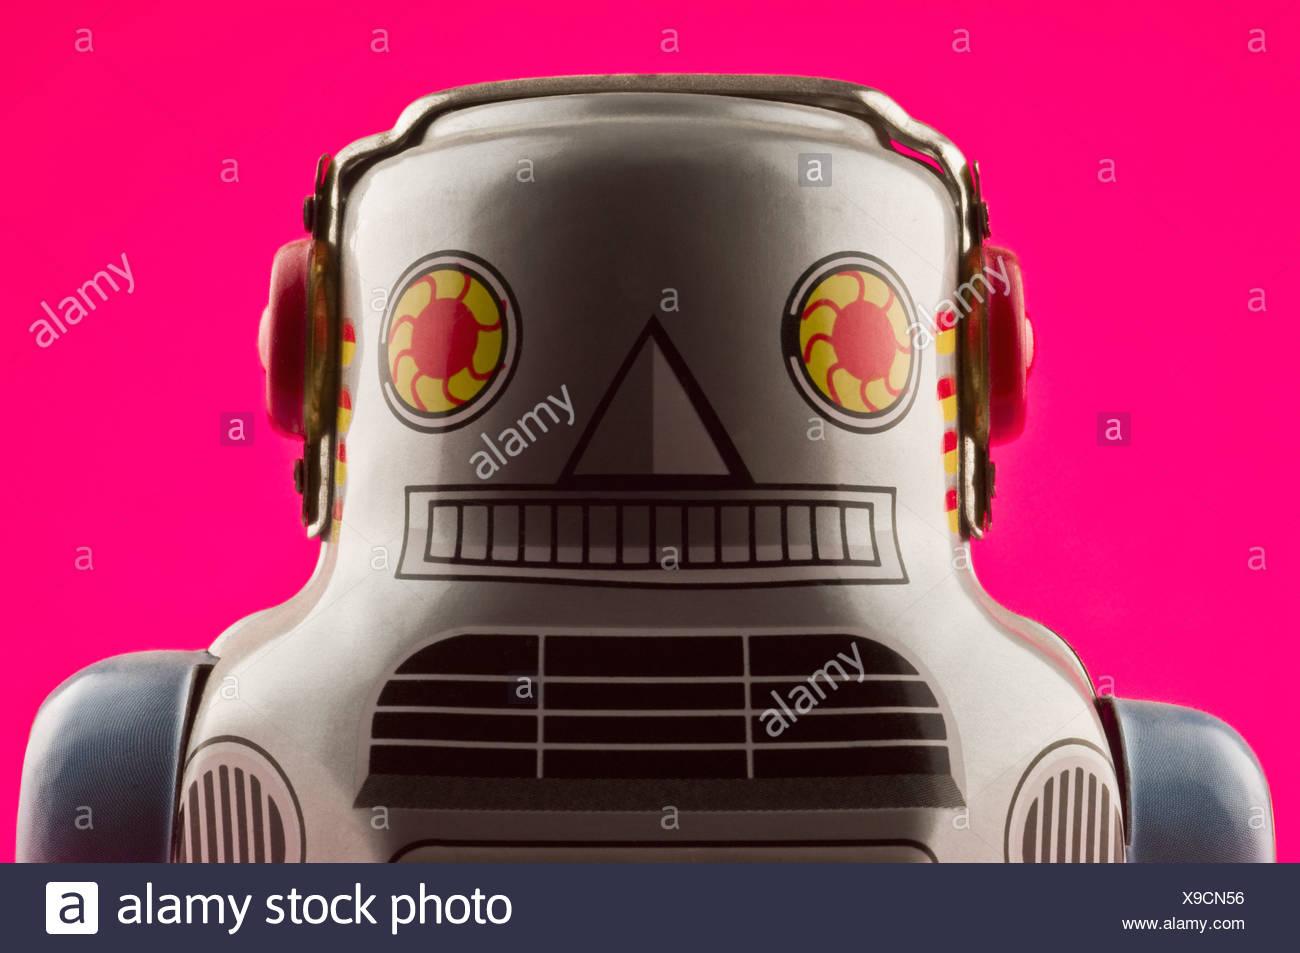 Robot jouet Photo Stock